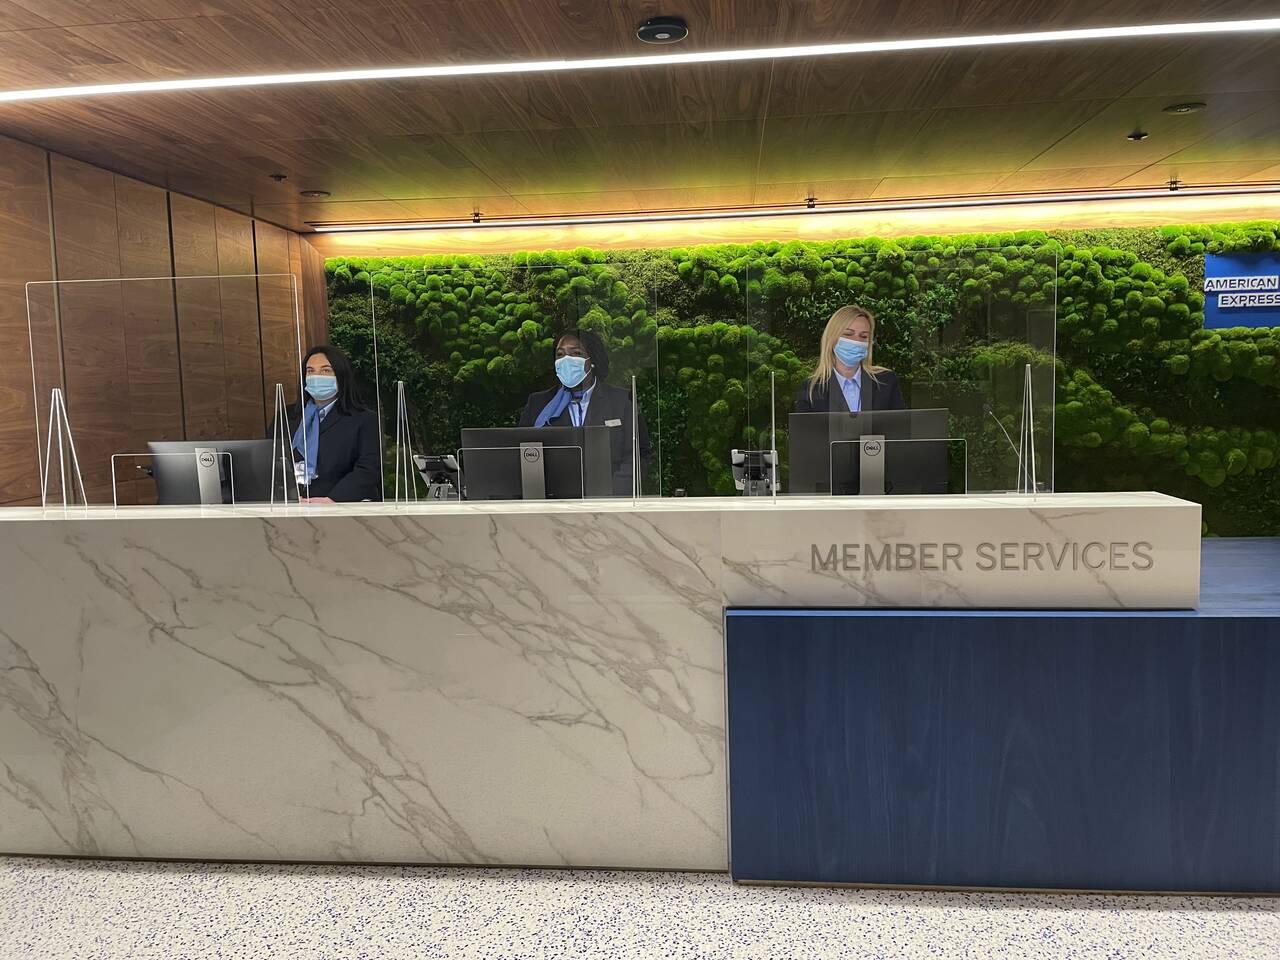 American Express Centurion Lounge Heathrow Airport reception